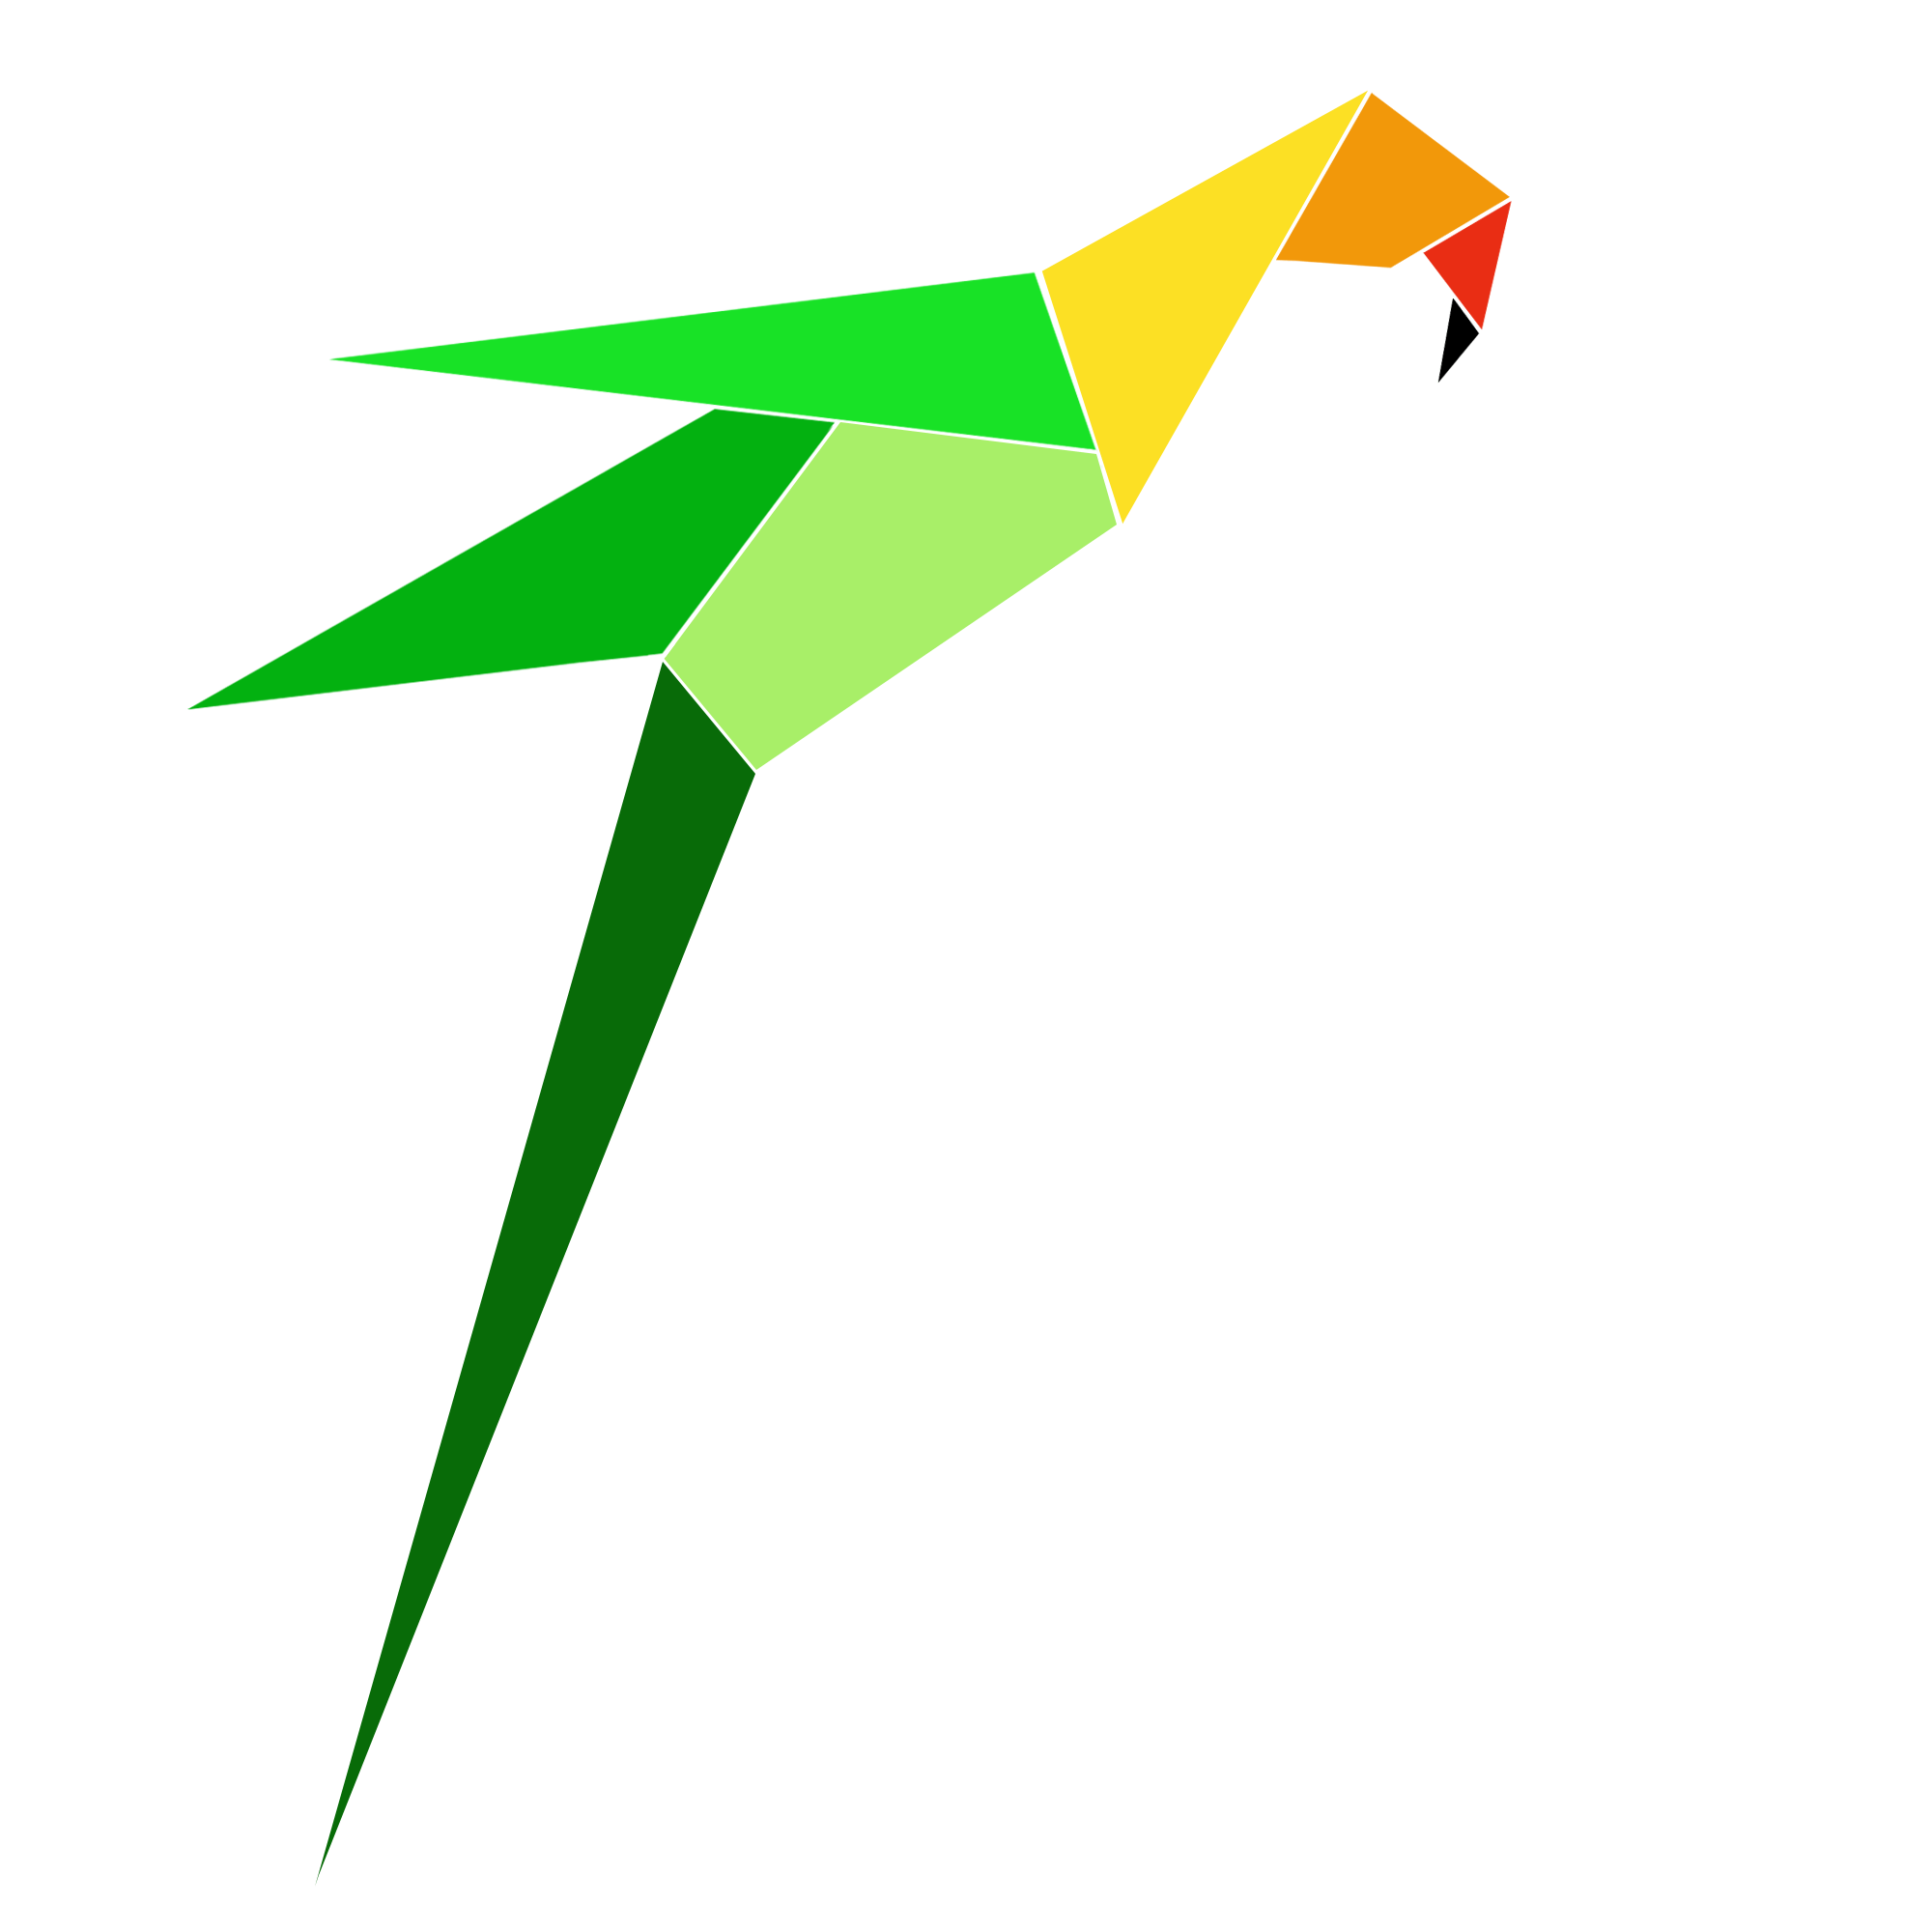 Parrot_logo-Eitd